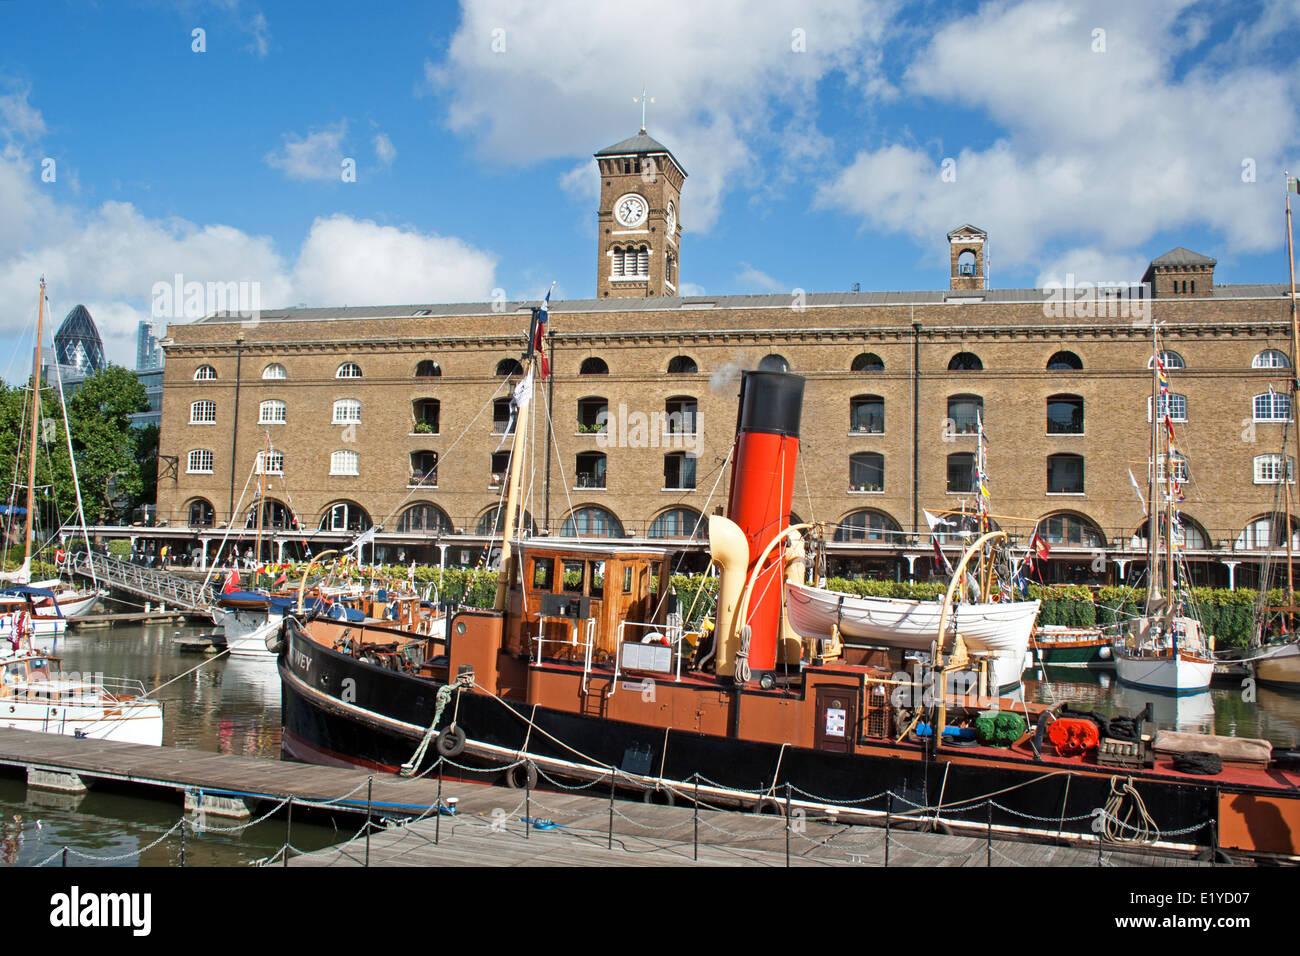 Tug boat on moorings in St Katharine Docks, Tower Hamlets, London, England, UK, Western Europe. - Stock Image